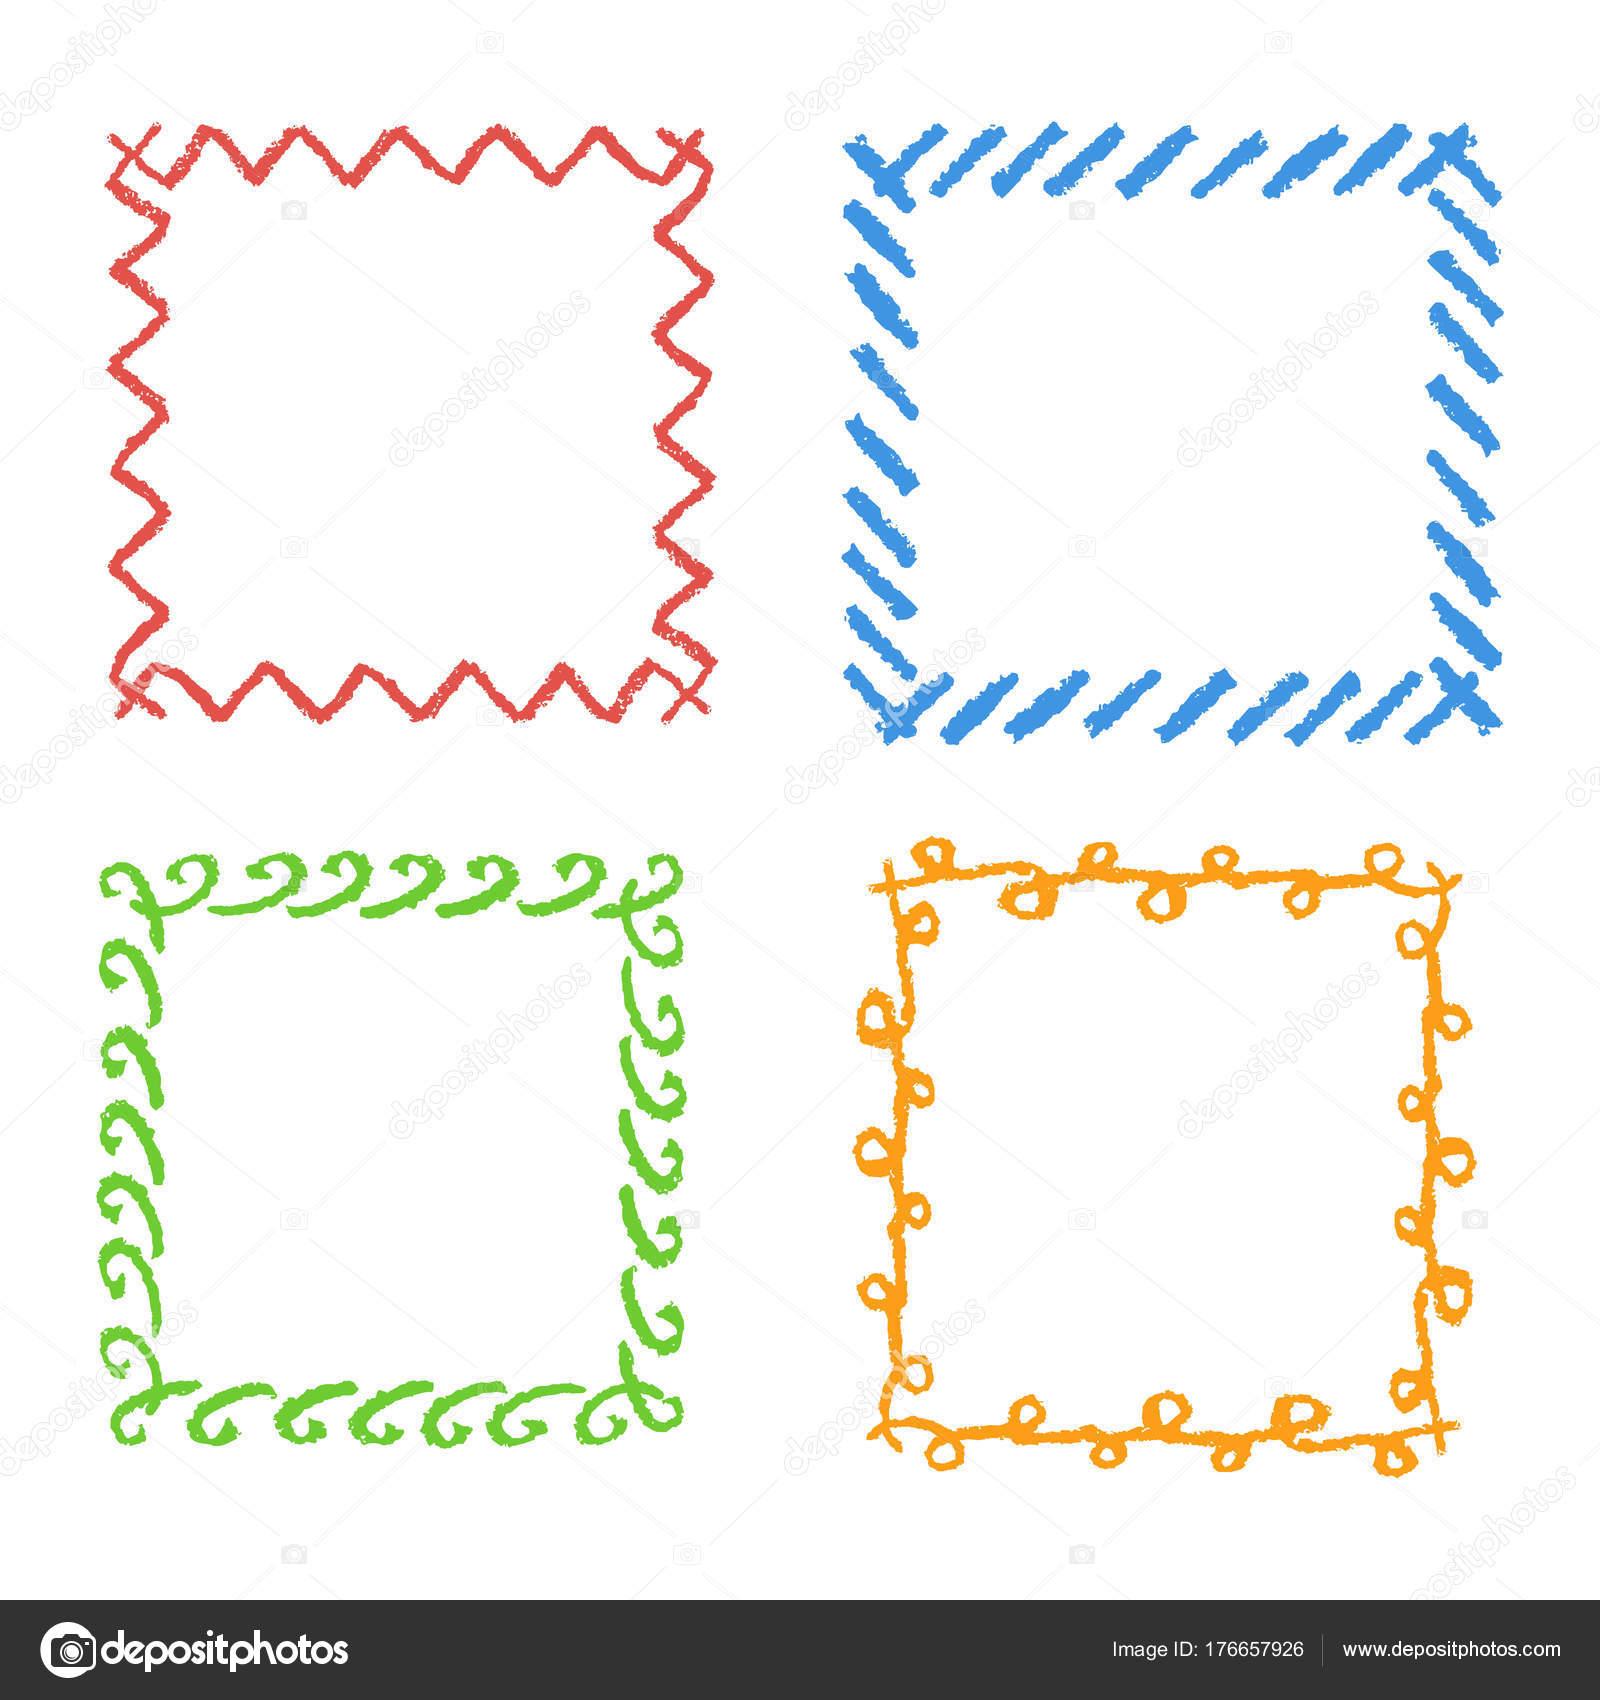 Crayon Hand Drawing Square Frames Set Colorful Rectangular Ornate ...